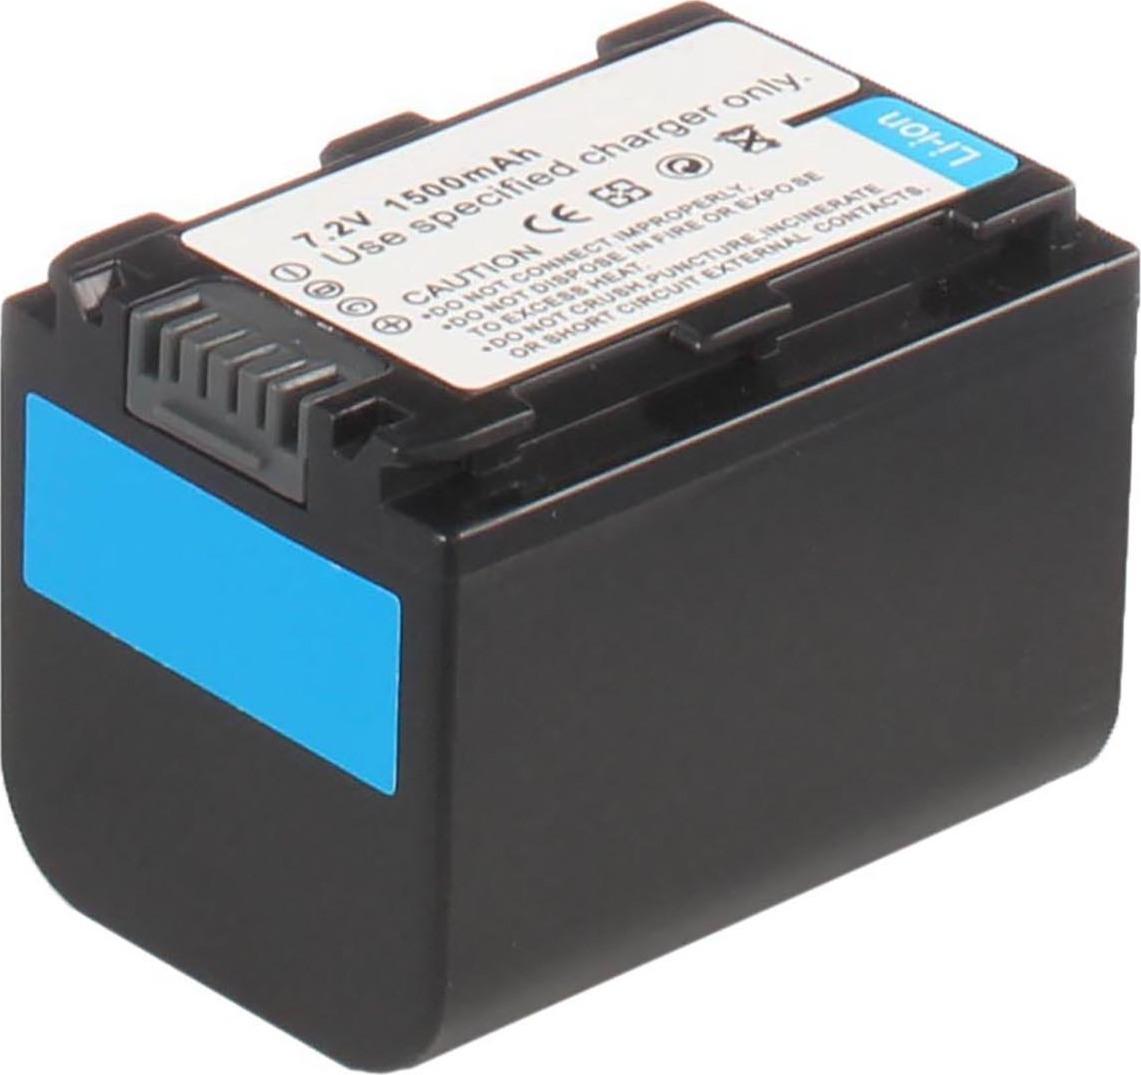 Аккумуляторная батарея iBatt iB-T6-F284 1300mAh для камер Sony HDR-SR5, DCR-HC51E, HDR-CX500E, HDR-SR8E, DCR-DVD106, DCR-HC47E, HDR-HC5, HDR-UX3E, HDR-XR200E, DCR-DVD306E, DCR-SR52E, HDR-CX520E, HDR-CX7, DCR-DVD910, DCR-HC28, DCR-HC38, HDR-CX105E,